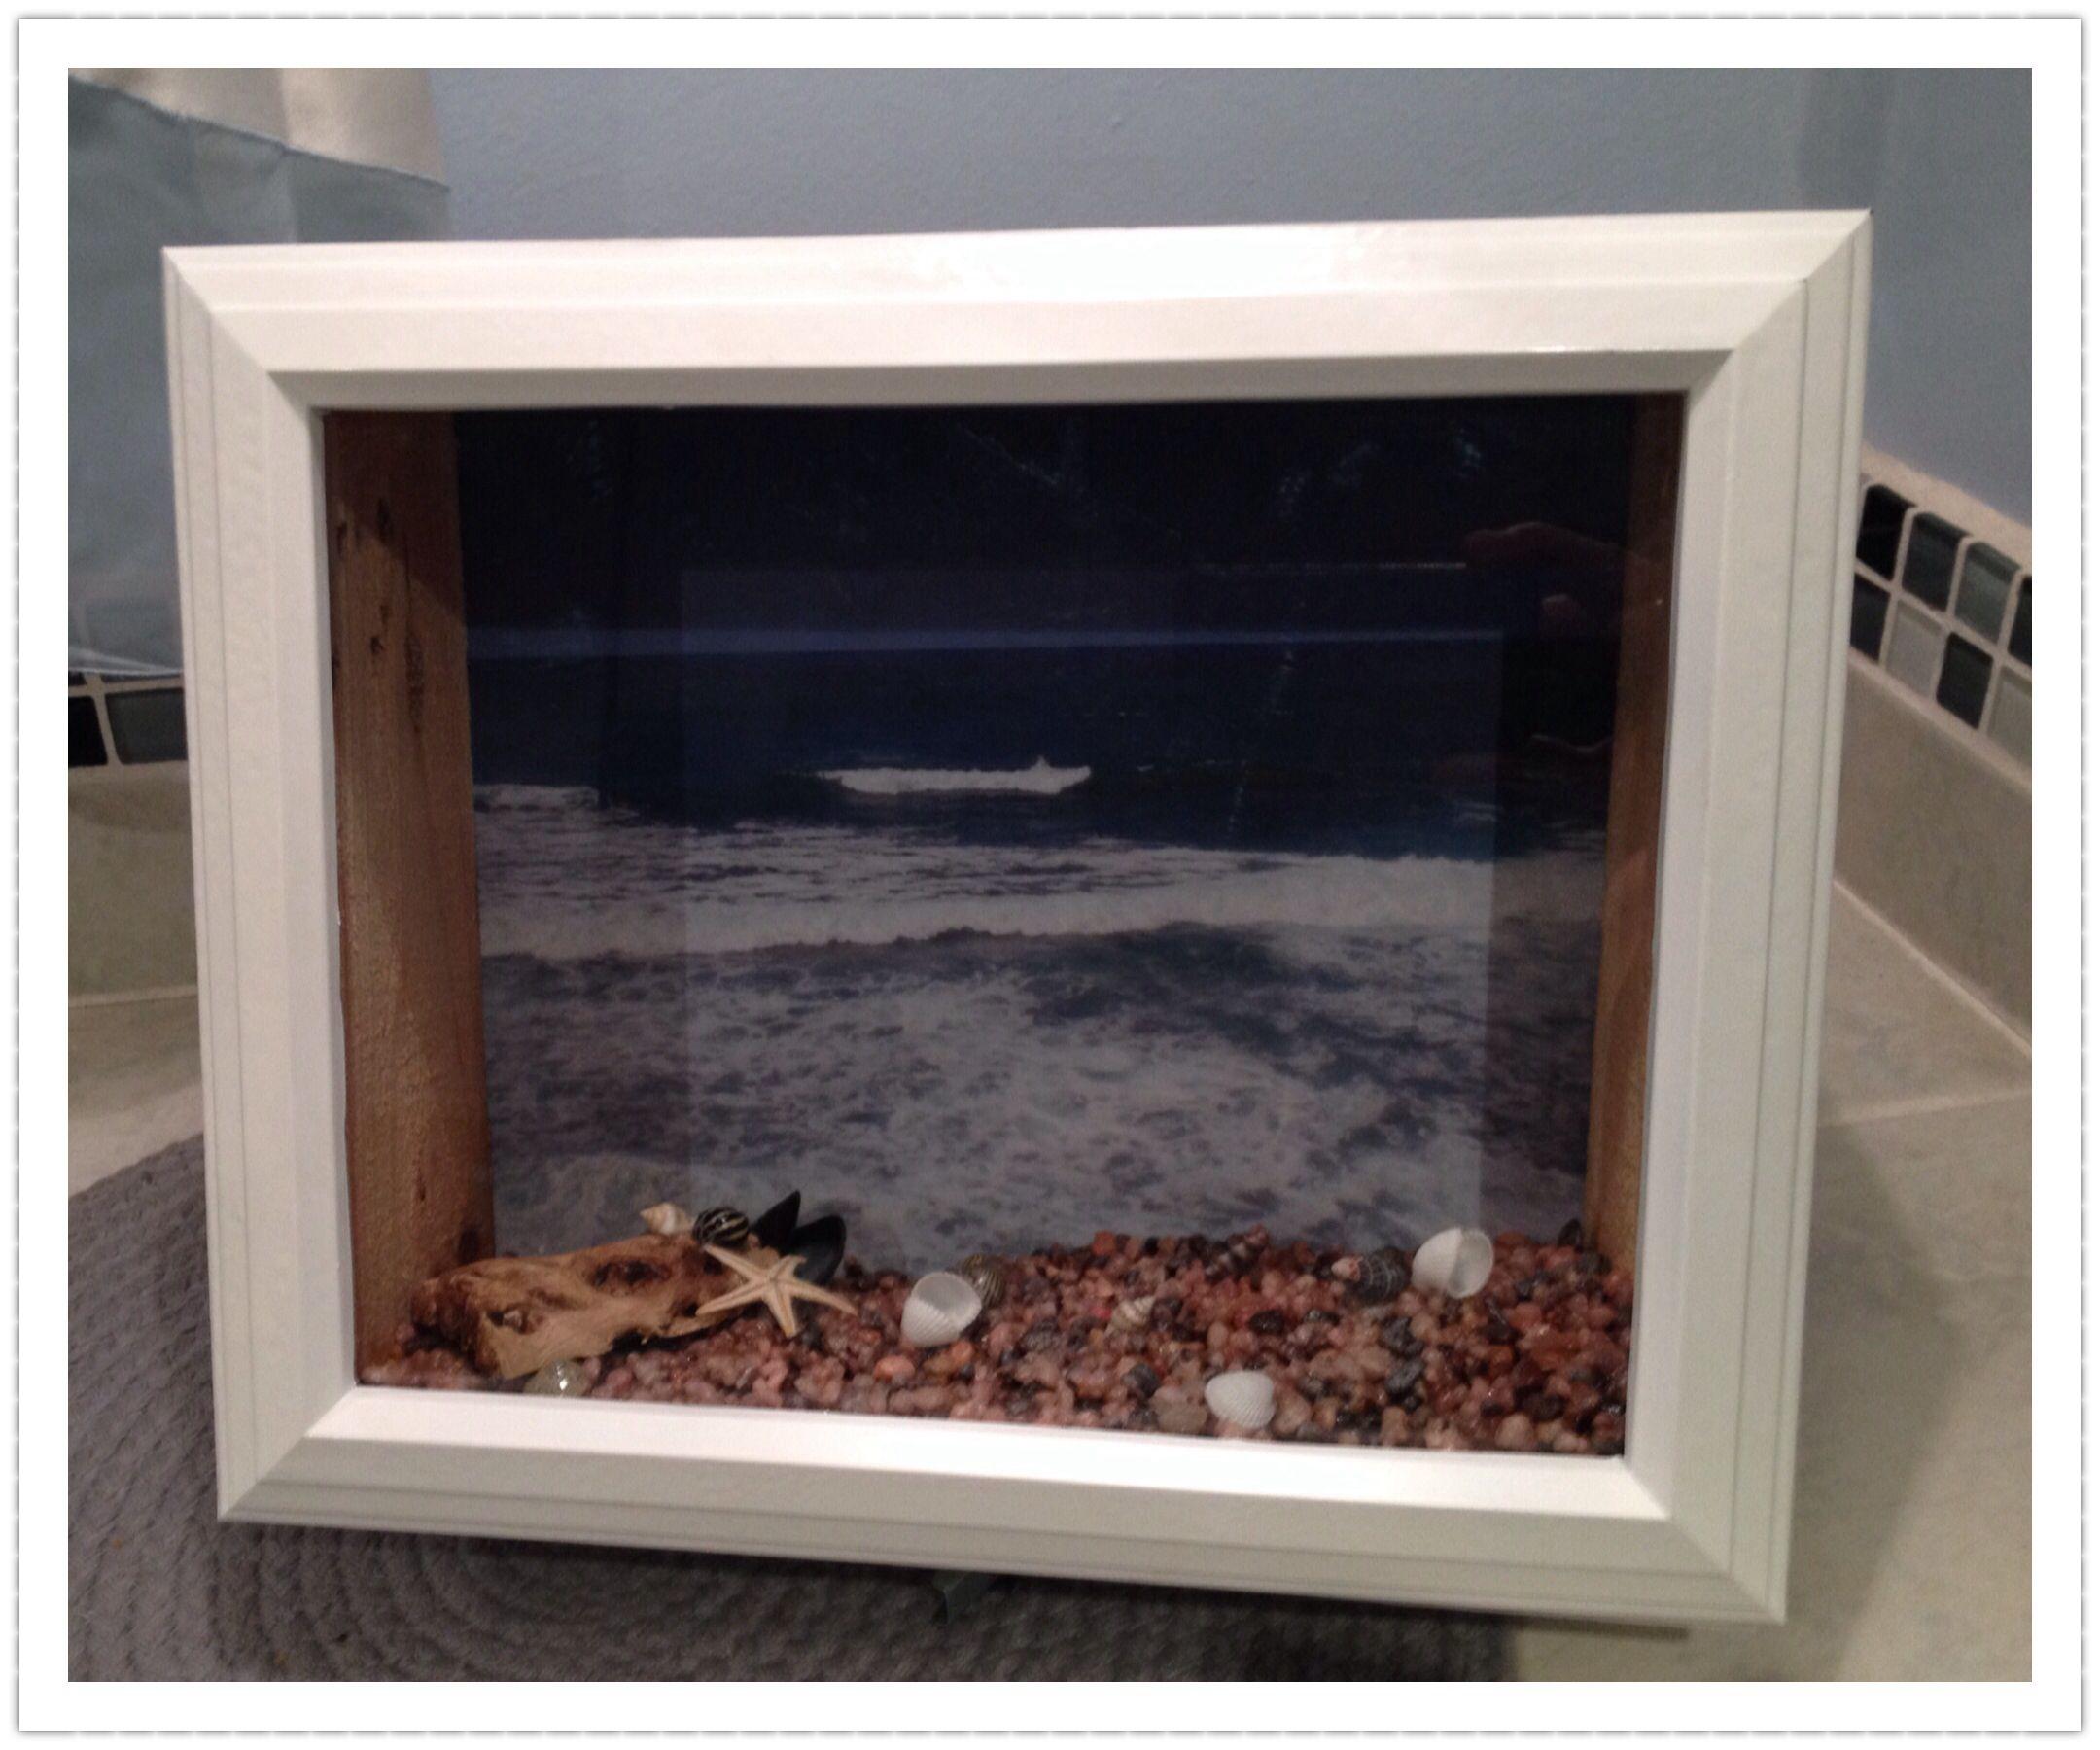 Beach Themed Shadow Box Ideas: Beach Theme Shadow Box, For More Info To Purchase @Etsy